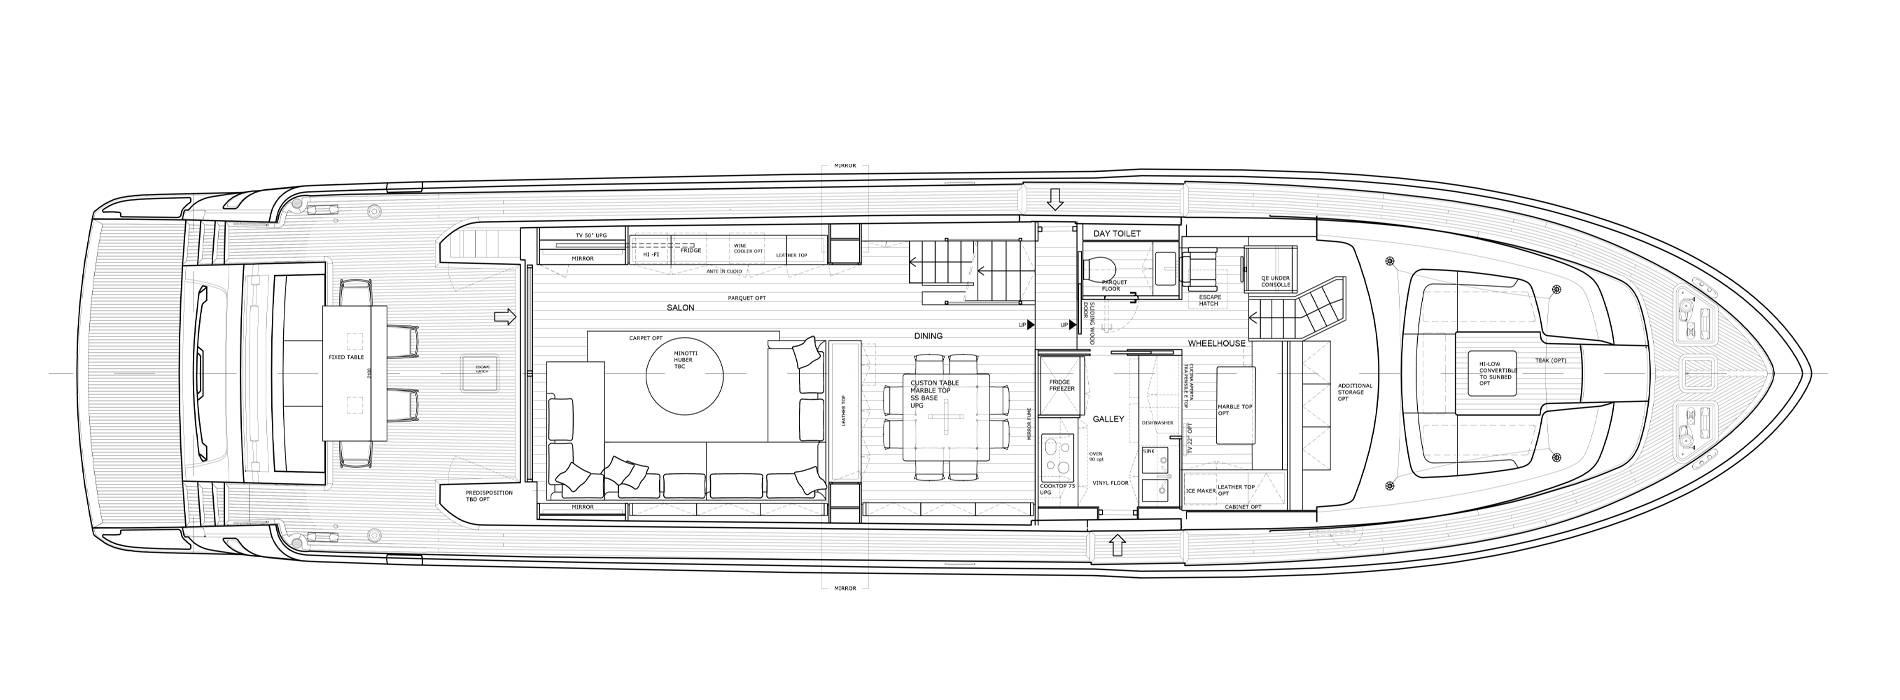 Sanlorenzo Yachts SL86-727 Main deck